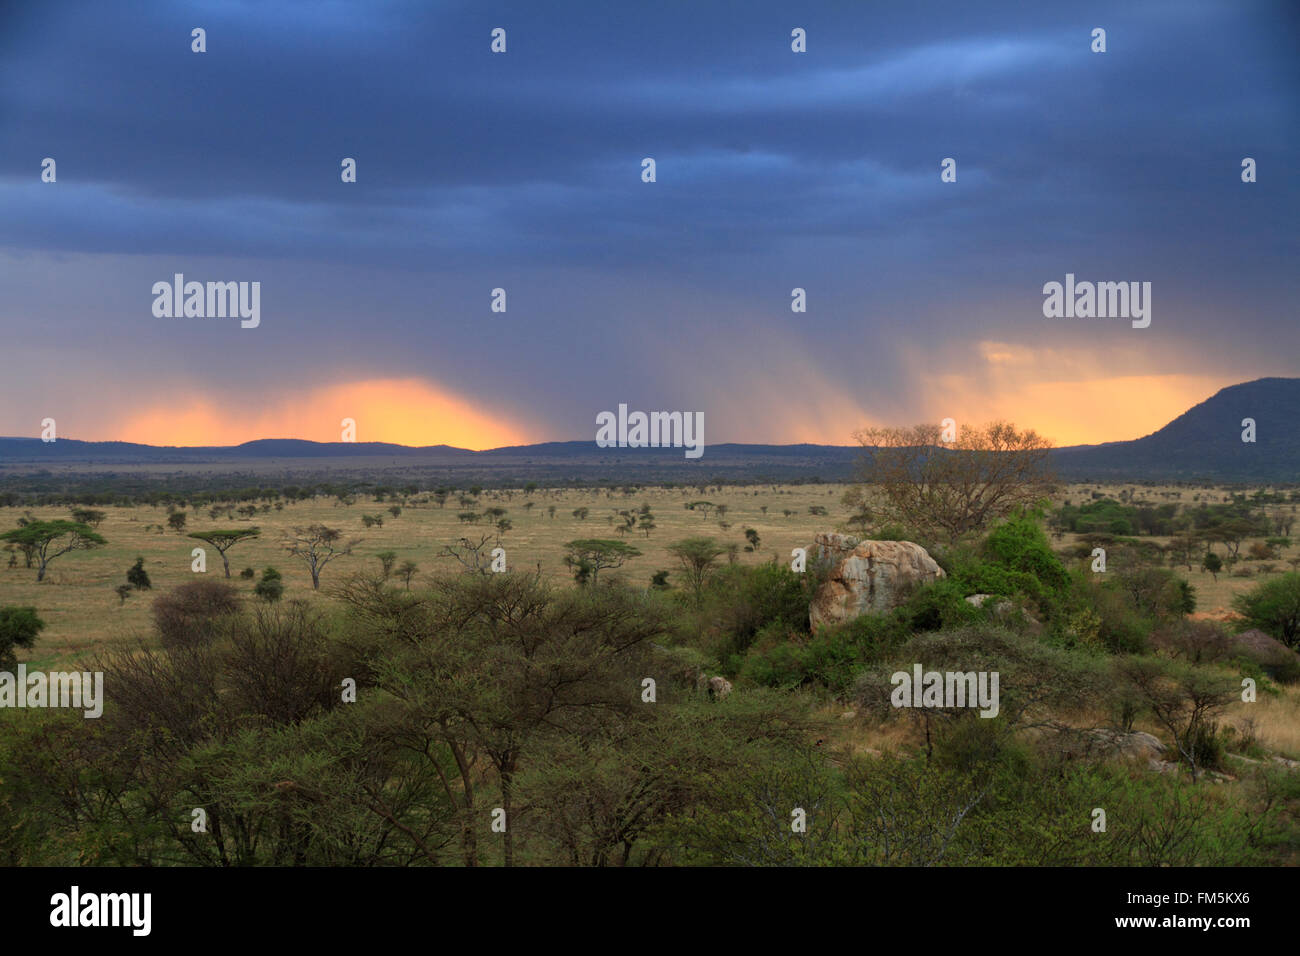 Una puesta de sol a través de las nubes de lluvia en la sabana africana Imagen De Stock